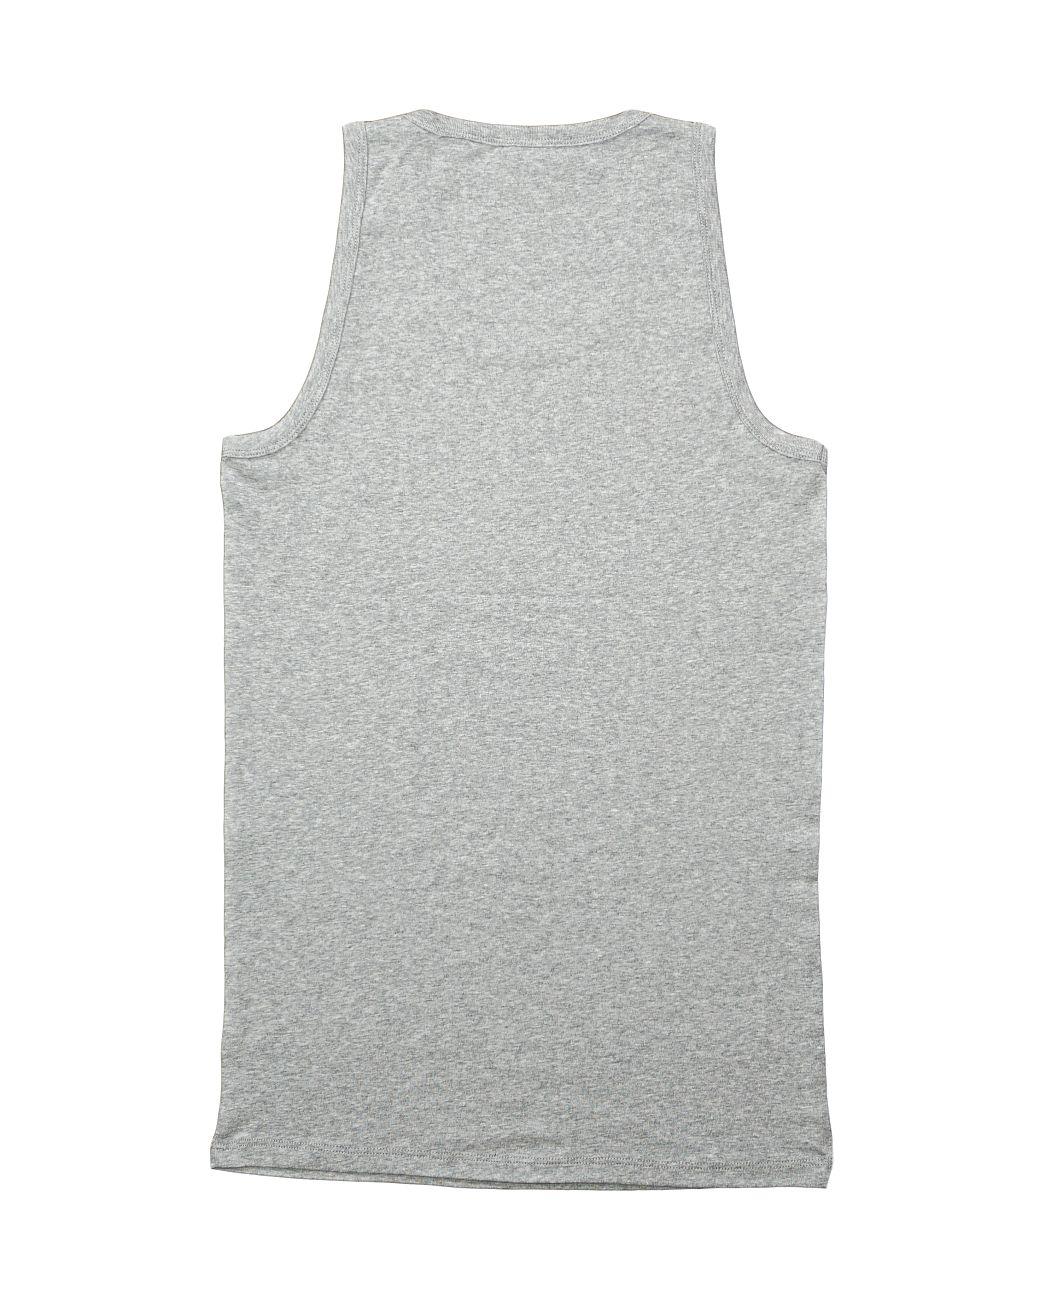 G-Star RAW 2er Pack Shirts Hemd Slim Fit D07206-124-906 Grey Htr F18-GSH1